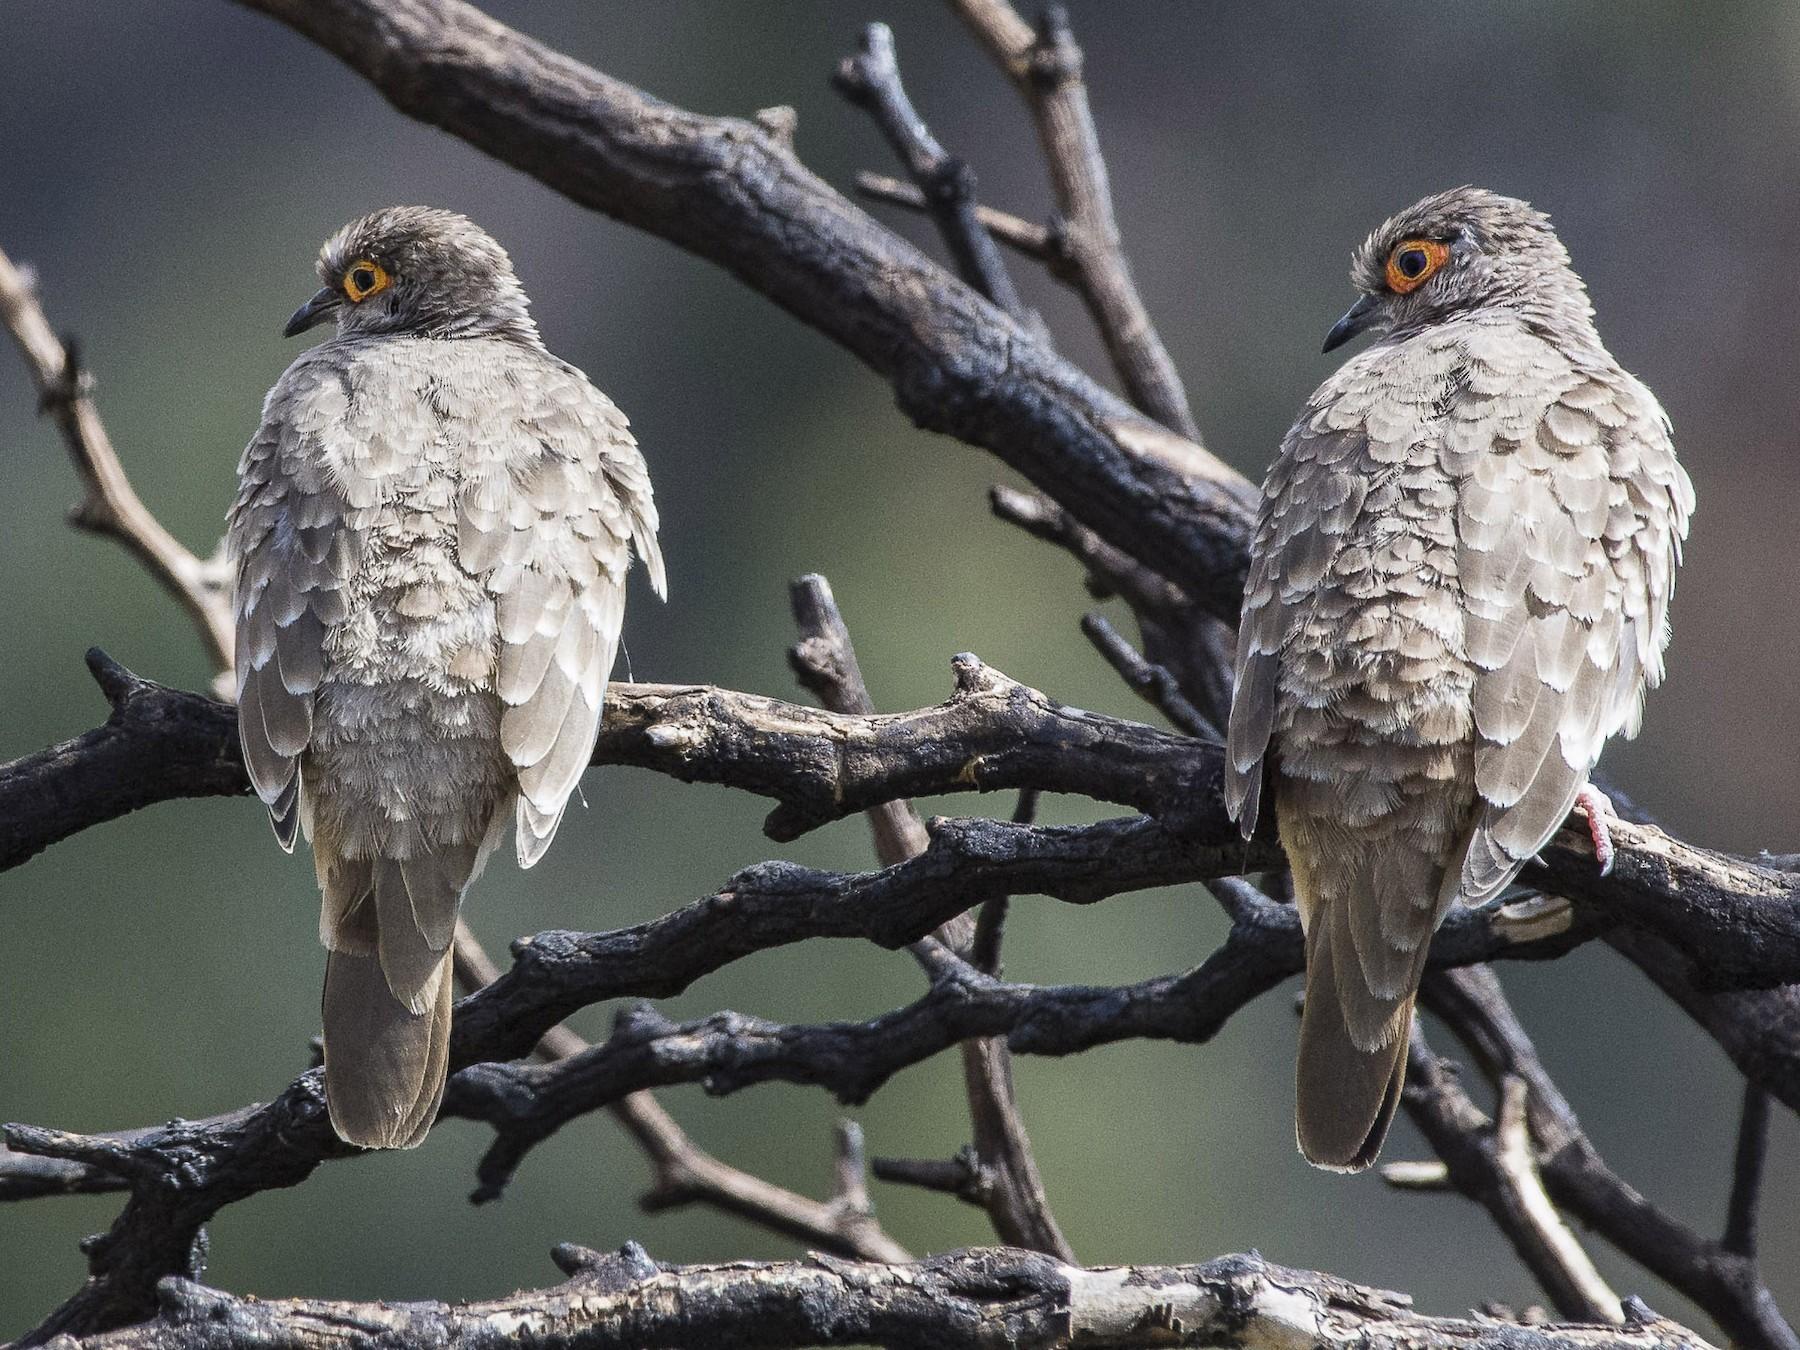 Bare-faced Ground Dove - VERONICA ARAYA GARCIA